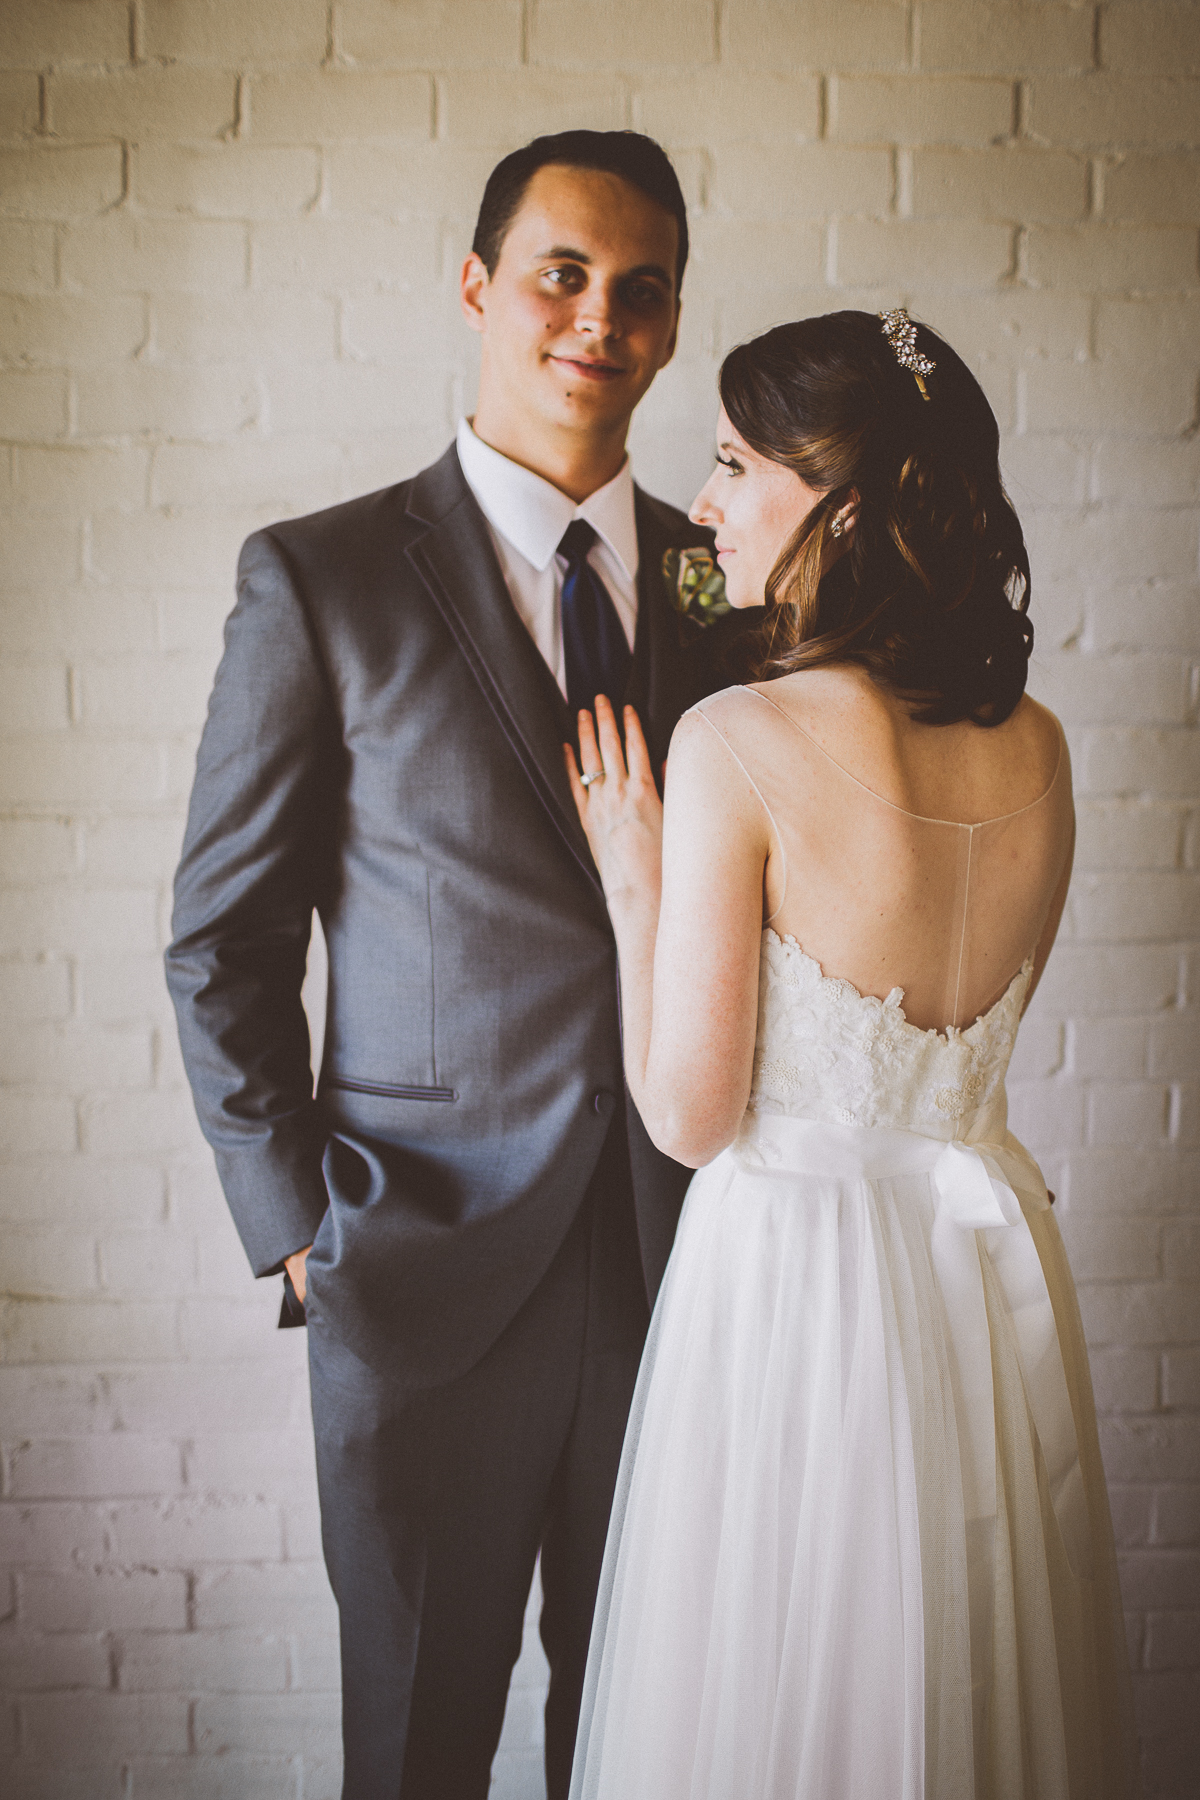 katie-pat-kelley-raye-atlanta-wedding-photographer-47.jpg